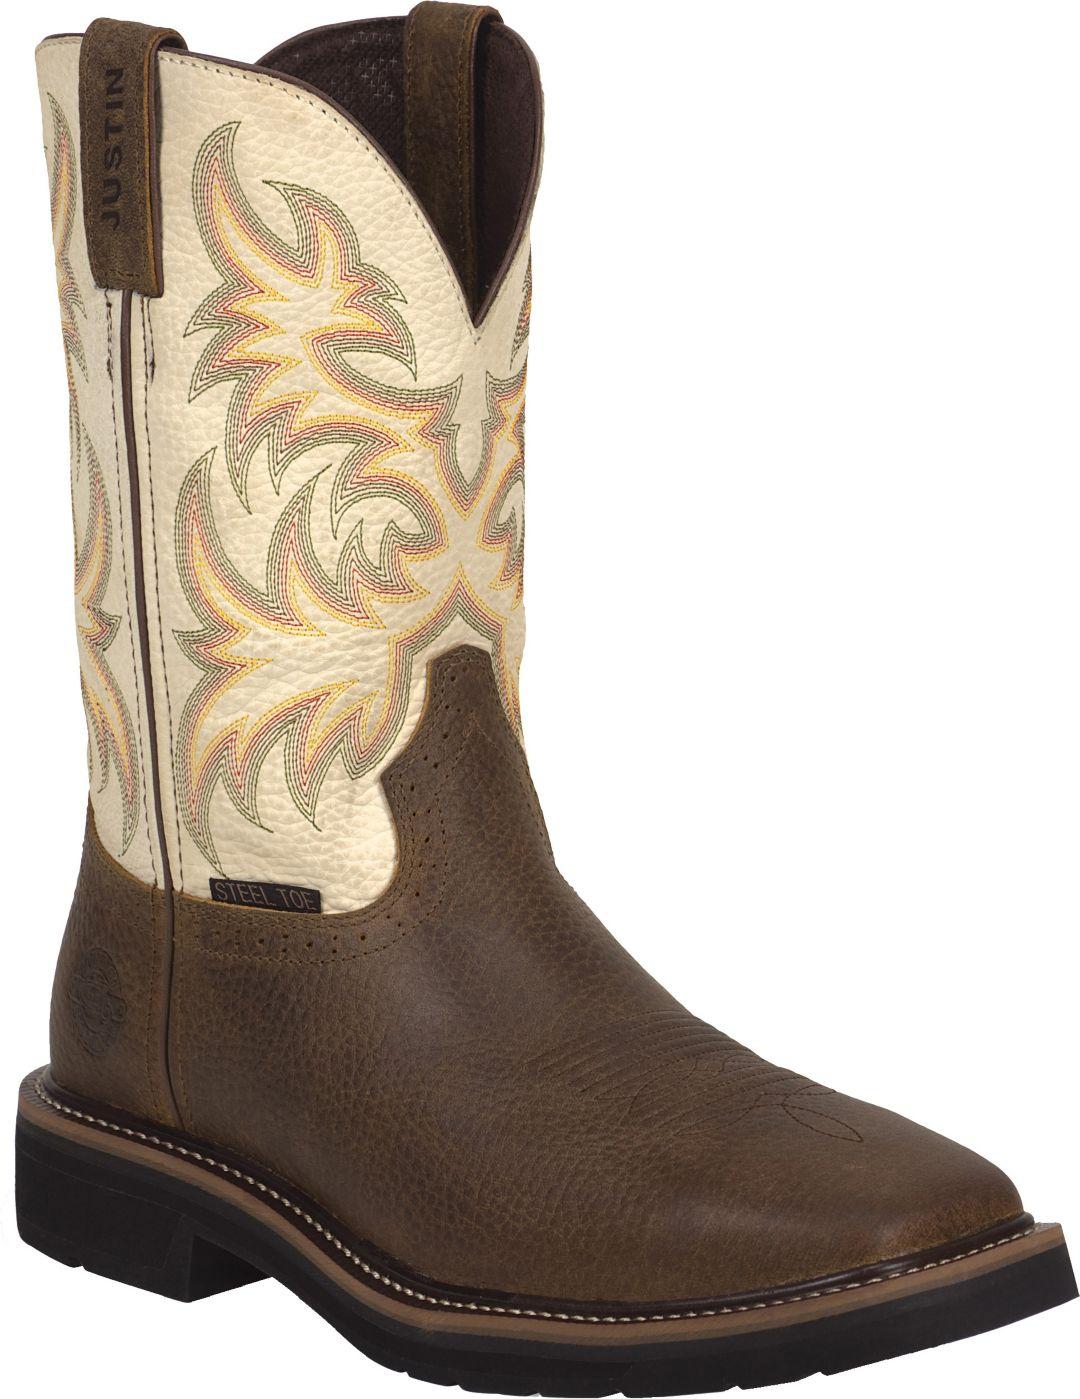 d07bf7b884b77 Justin Men's Copper Kettle Stampede Steel Toe Work Boots. noImageFound. 1